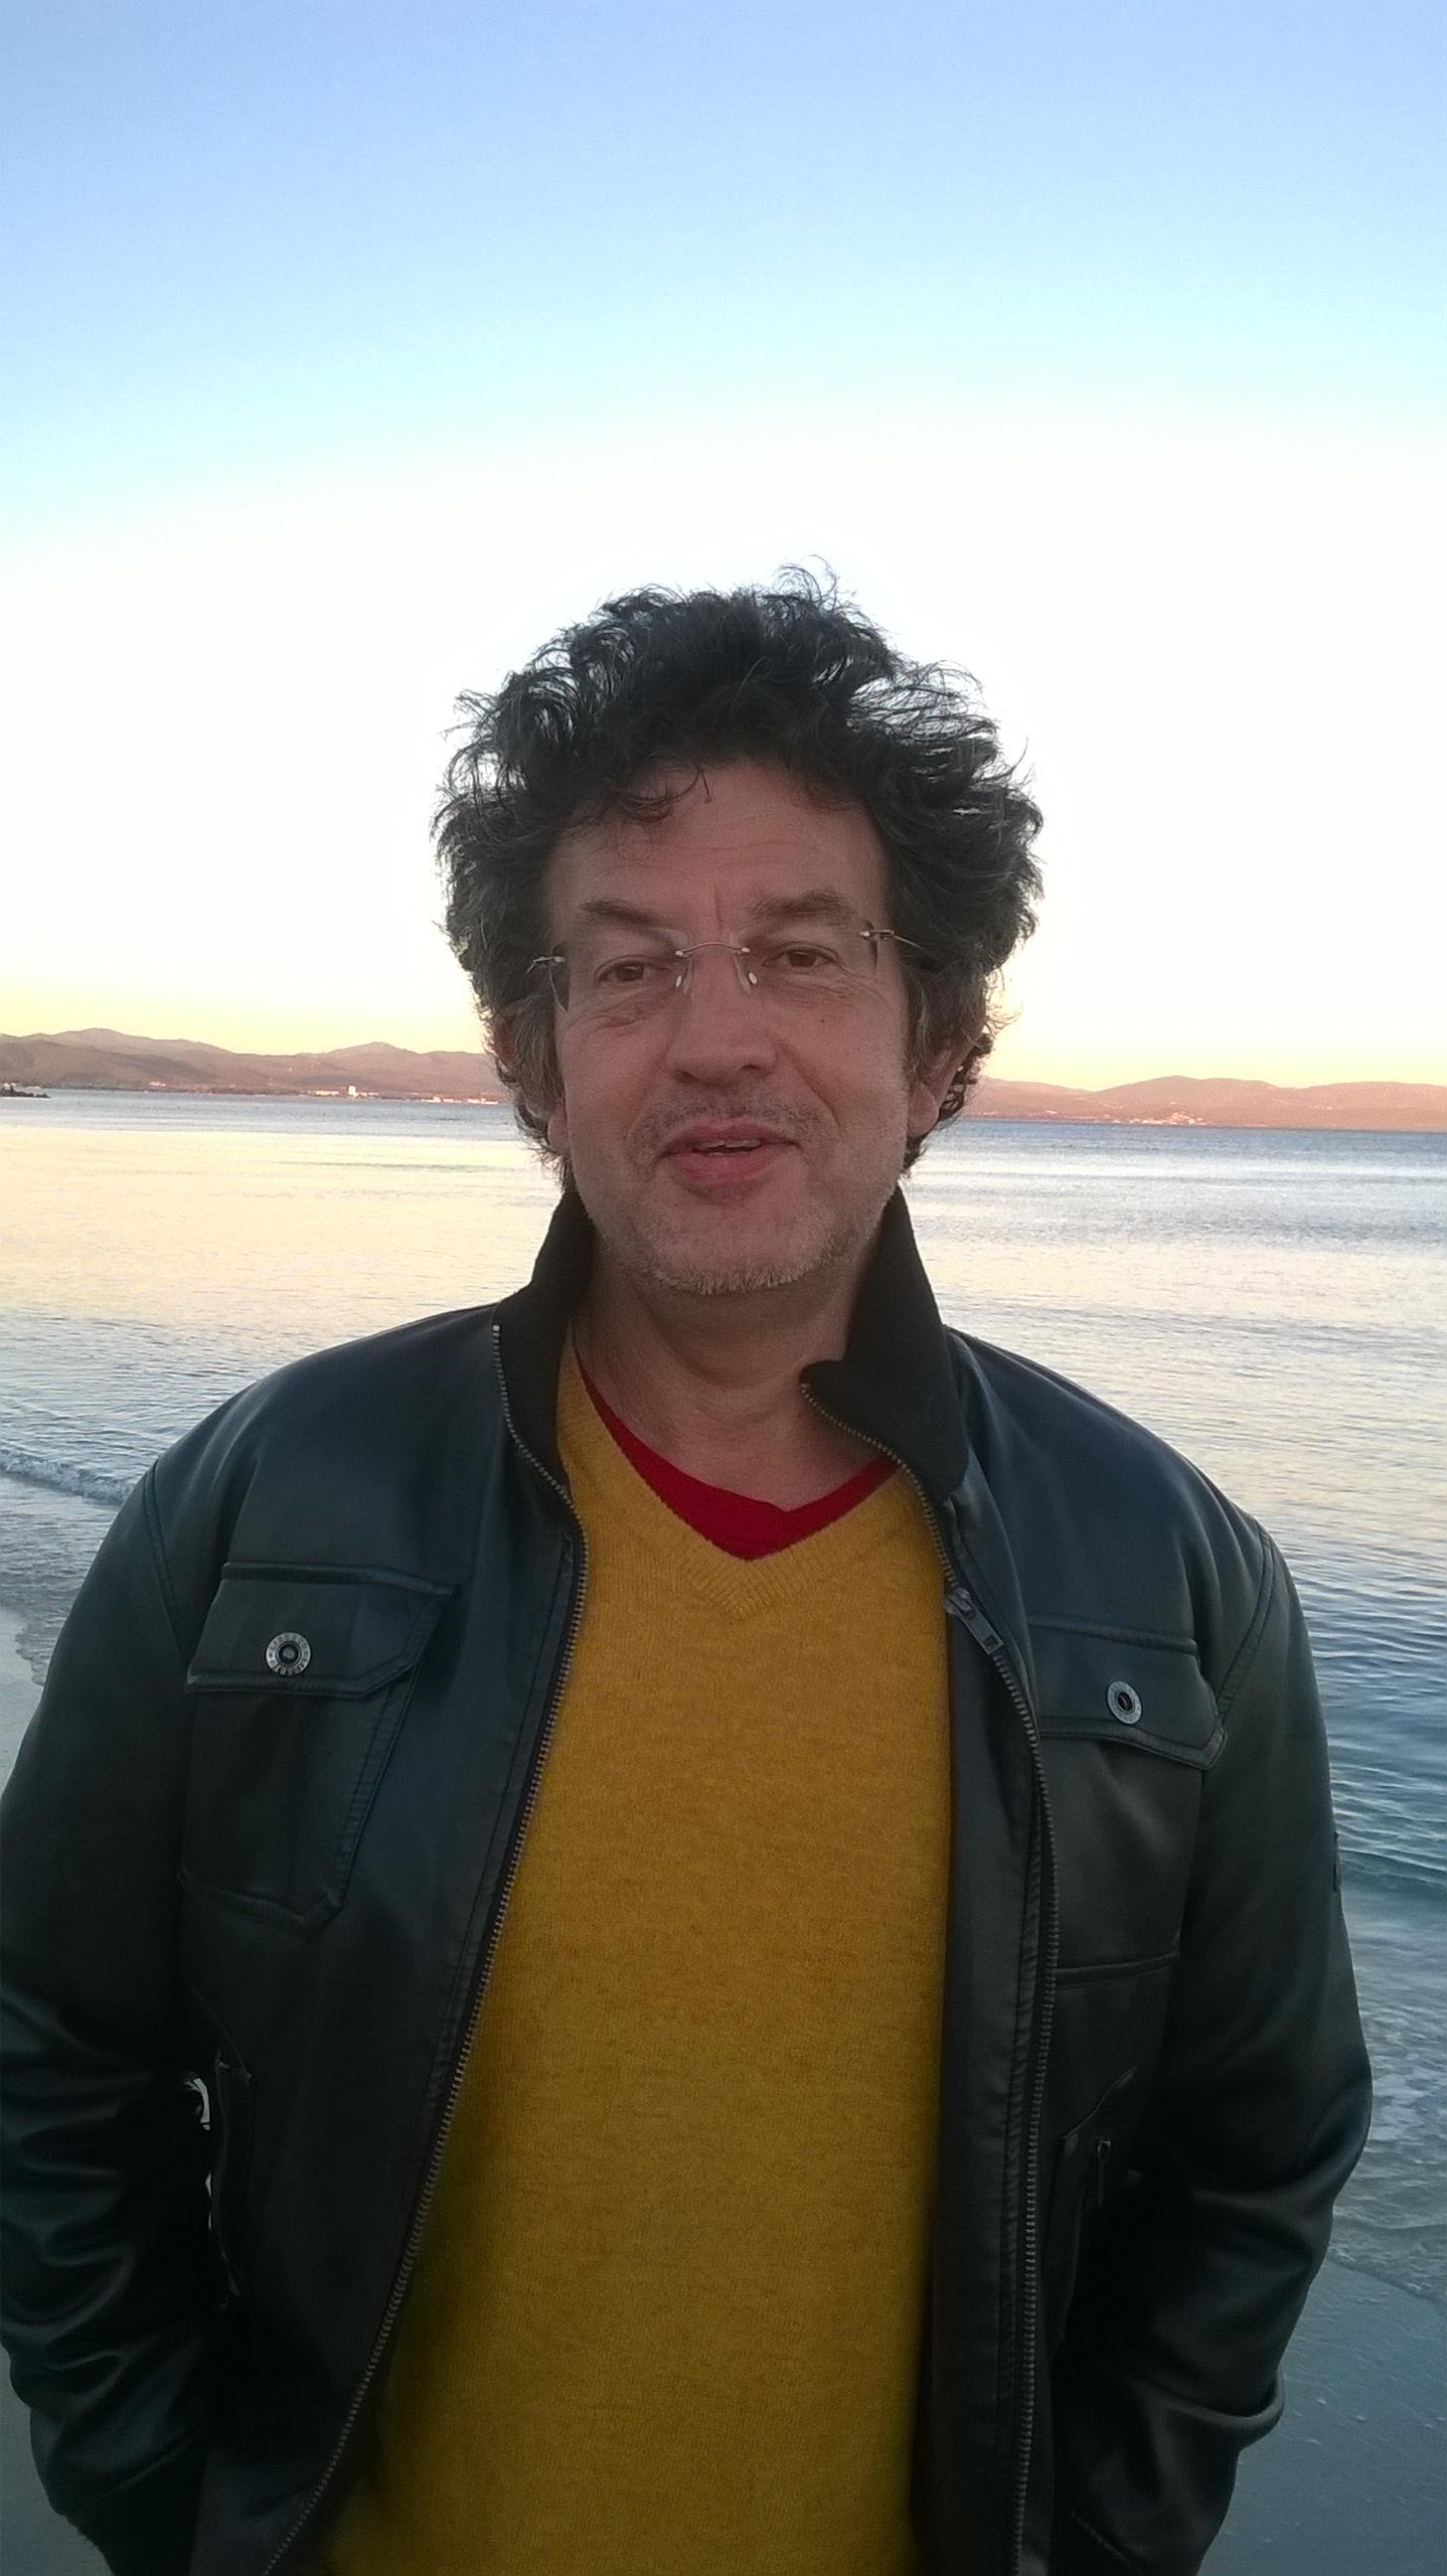 Gilles Desnots